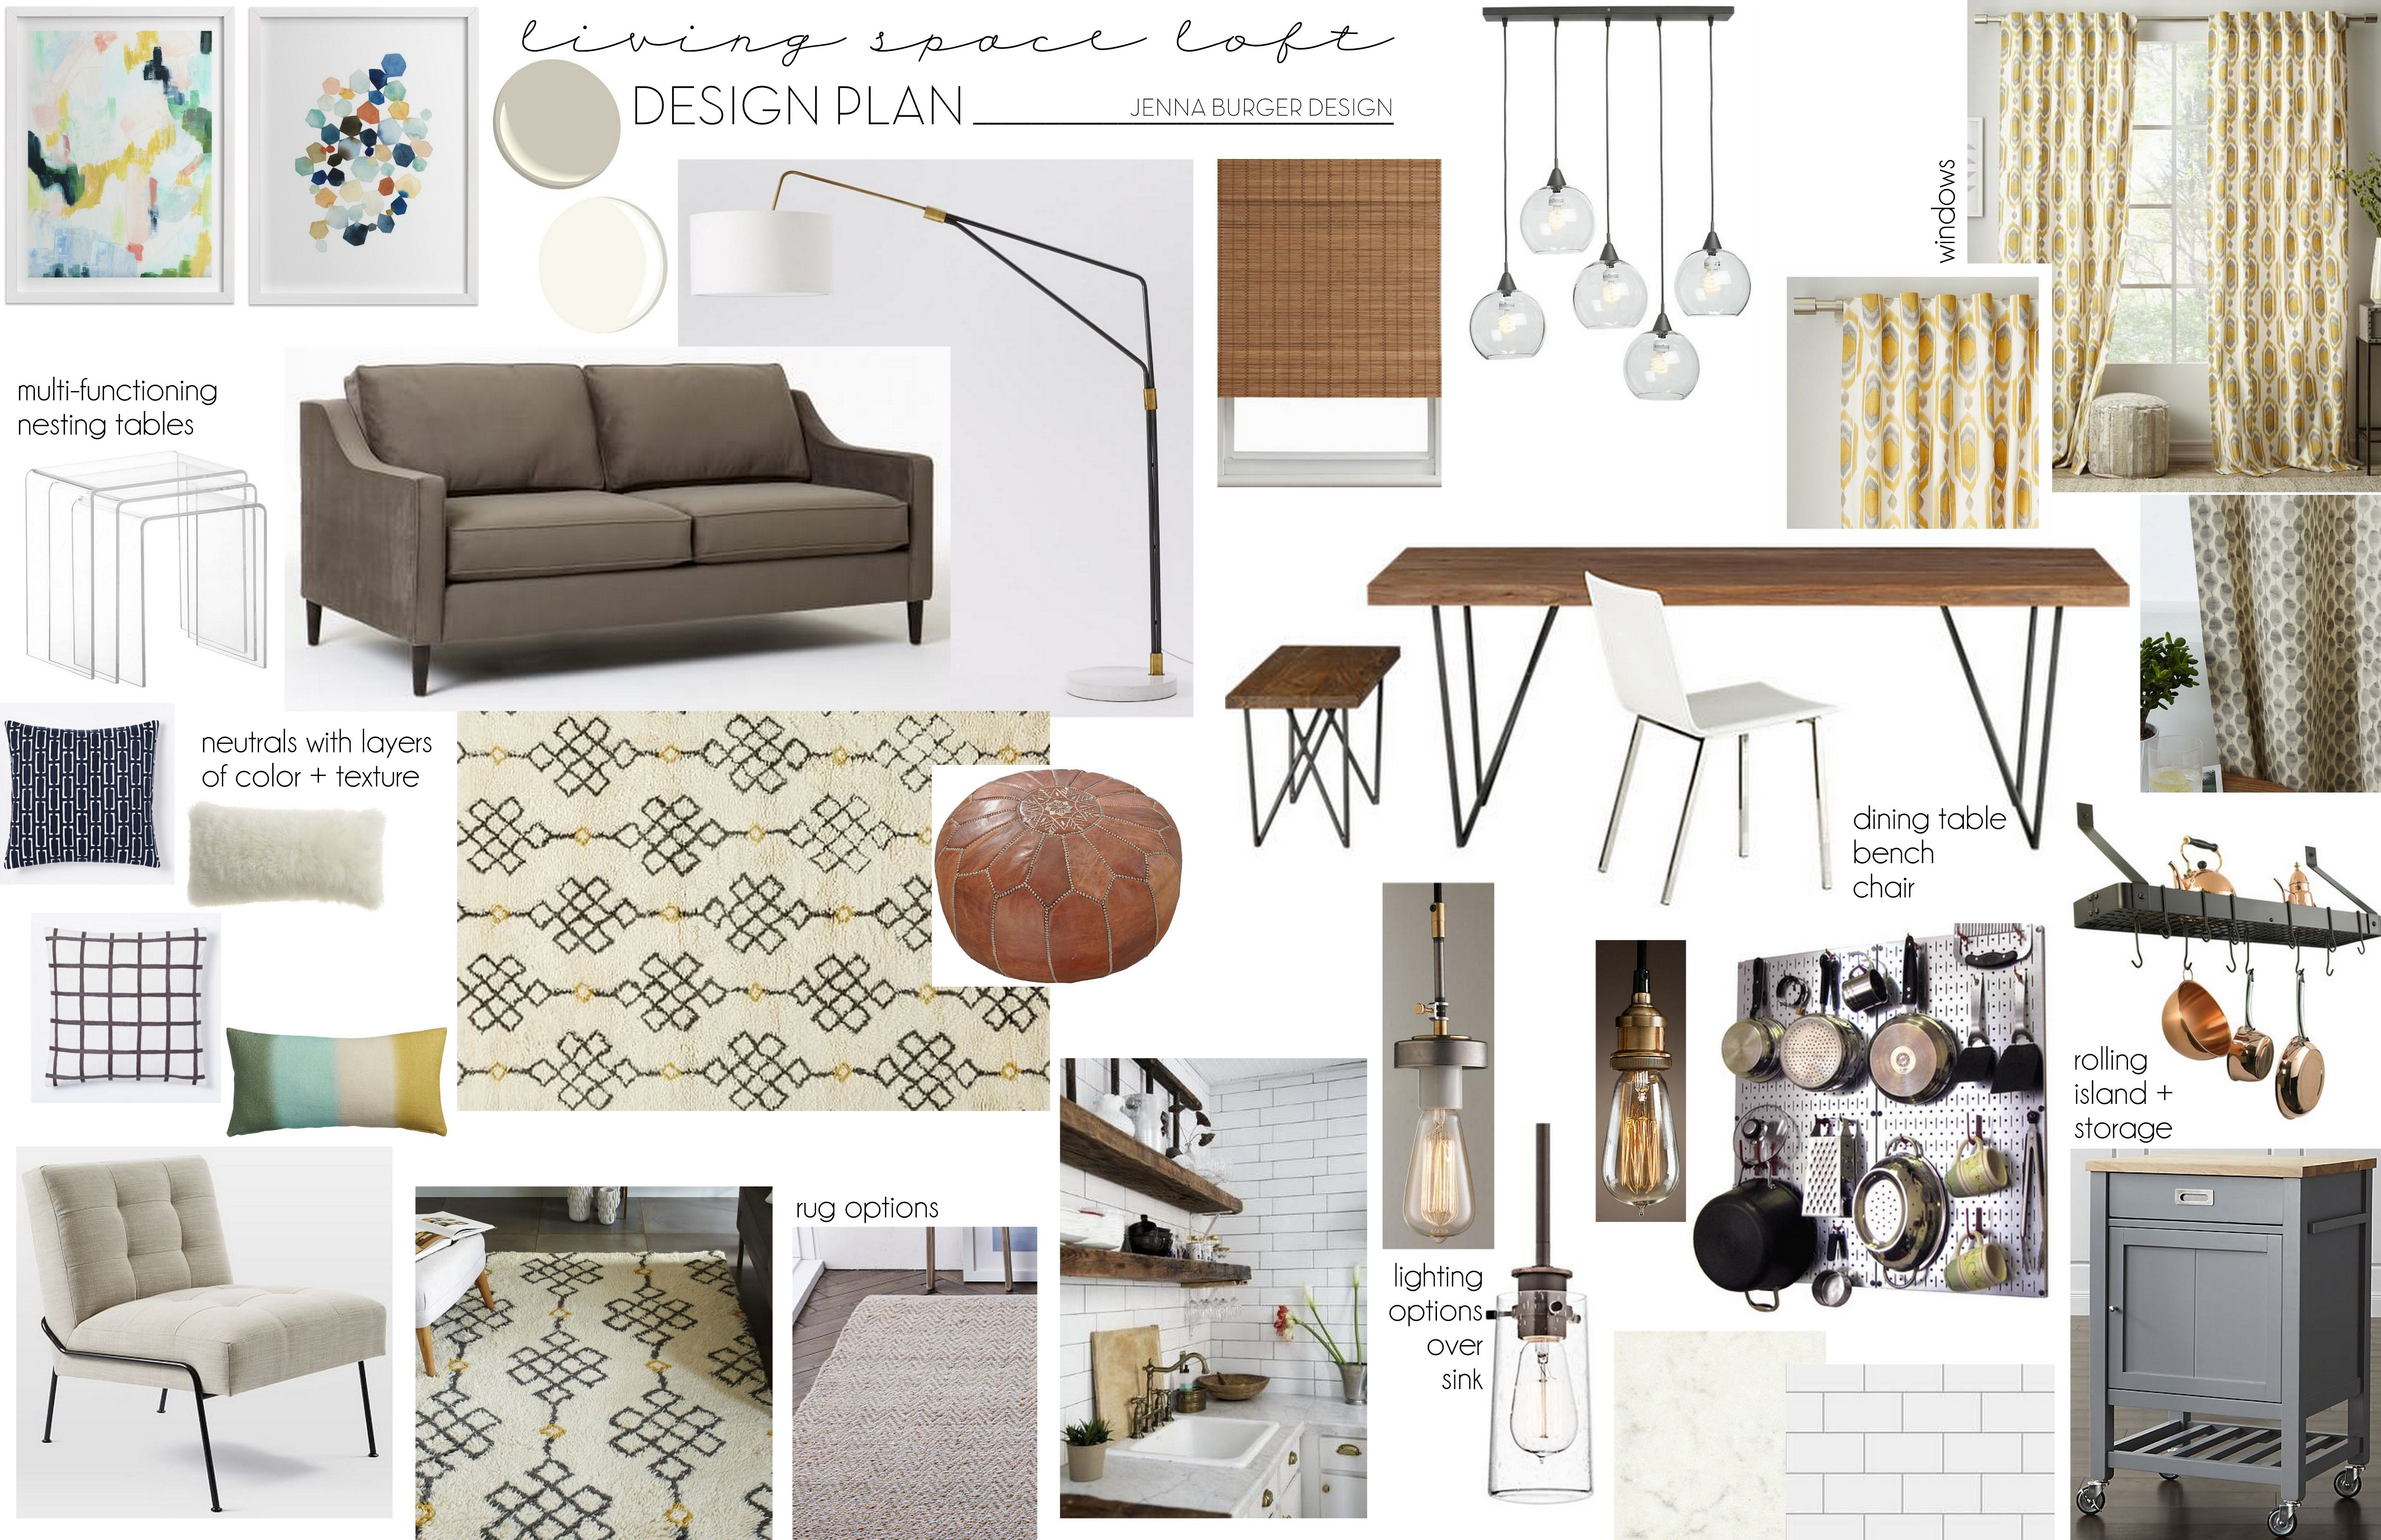 Creating An Interior Design Plan Mood Board Interior Design